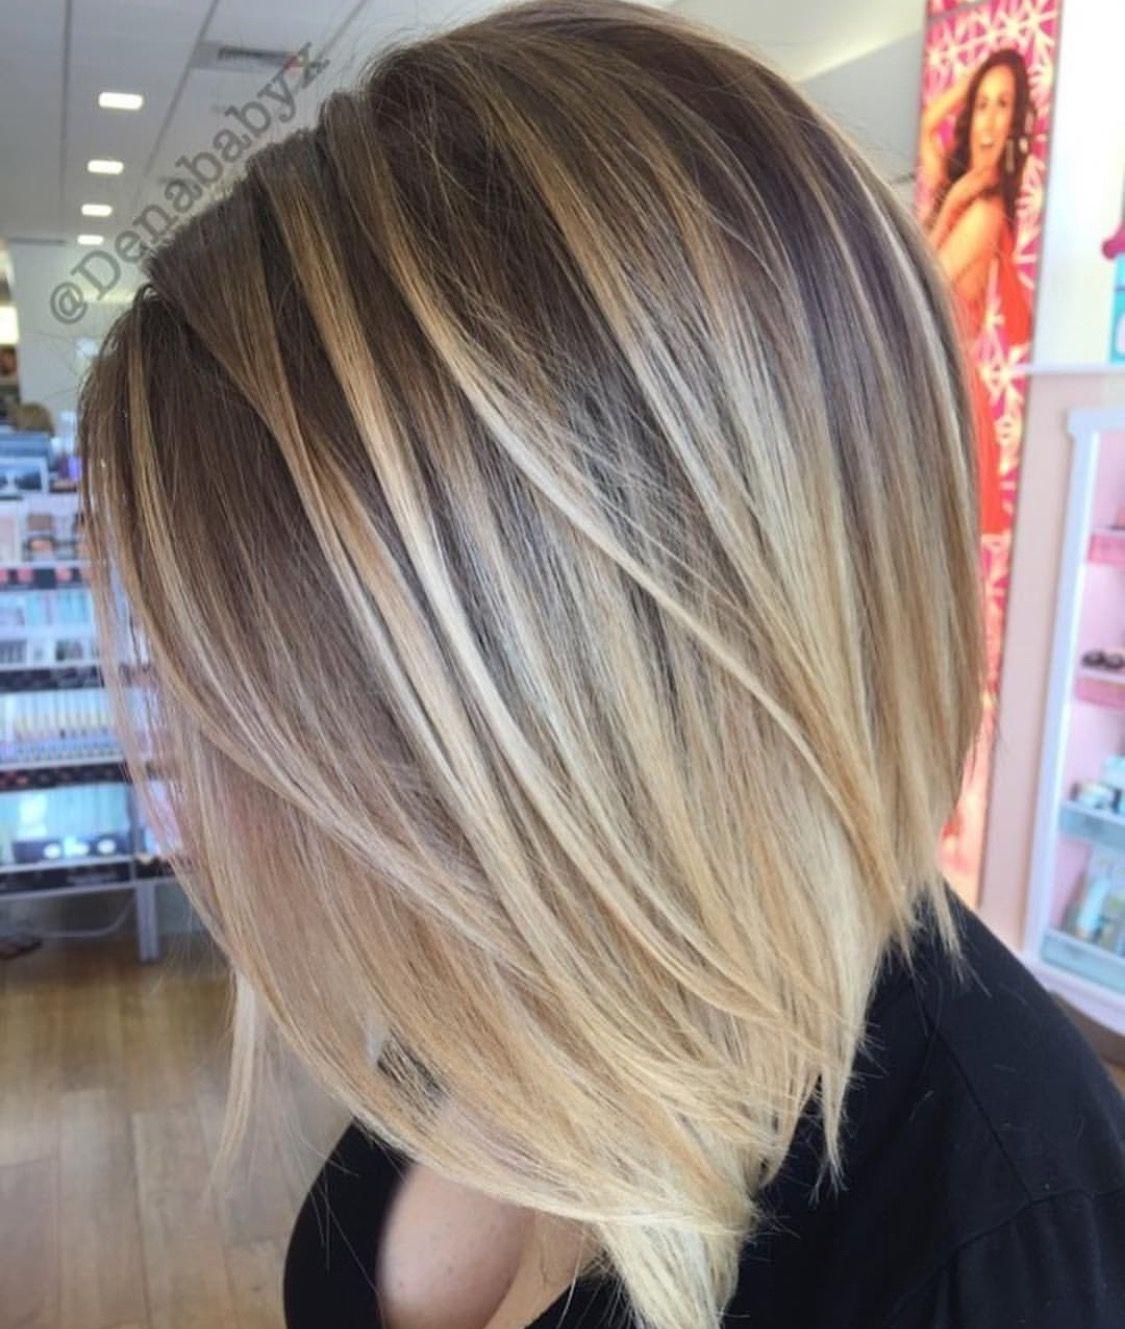 Short Hair Blonde Balayage Highlights Natural Ice Queen Lowlights Straight Hair Cuttin Blonde Balayage Highlights Blonde Balayage Balayage Straight Hair